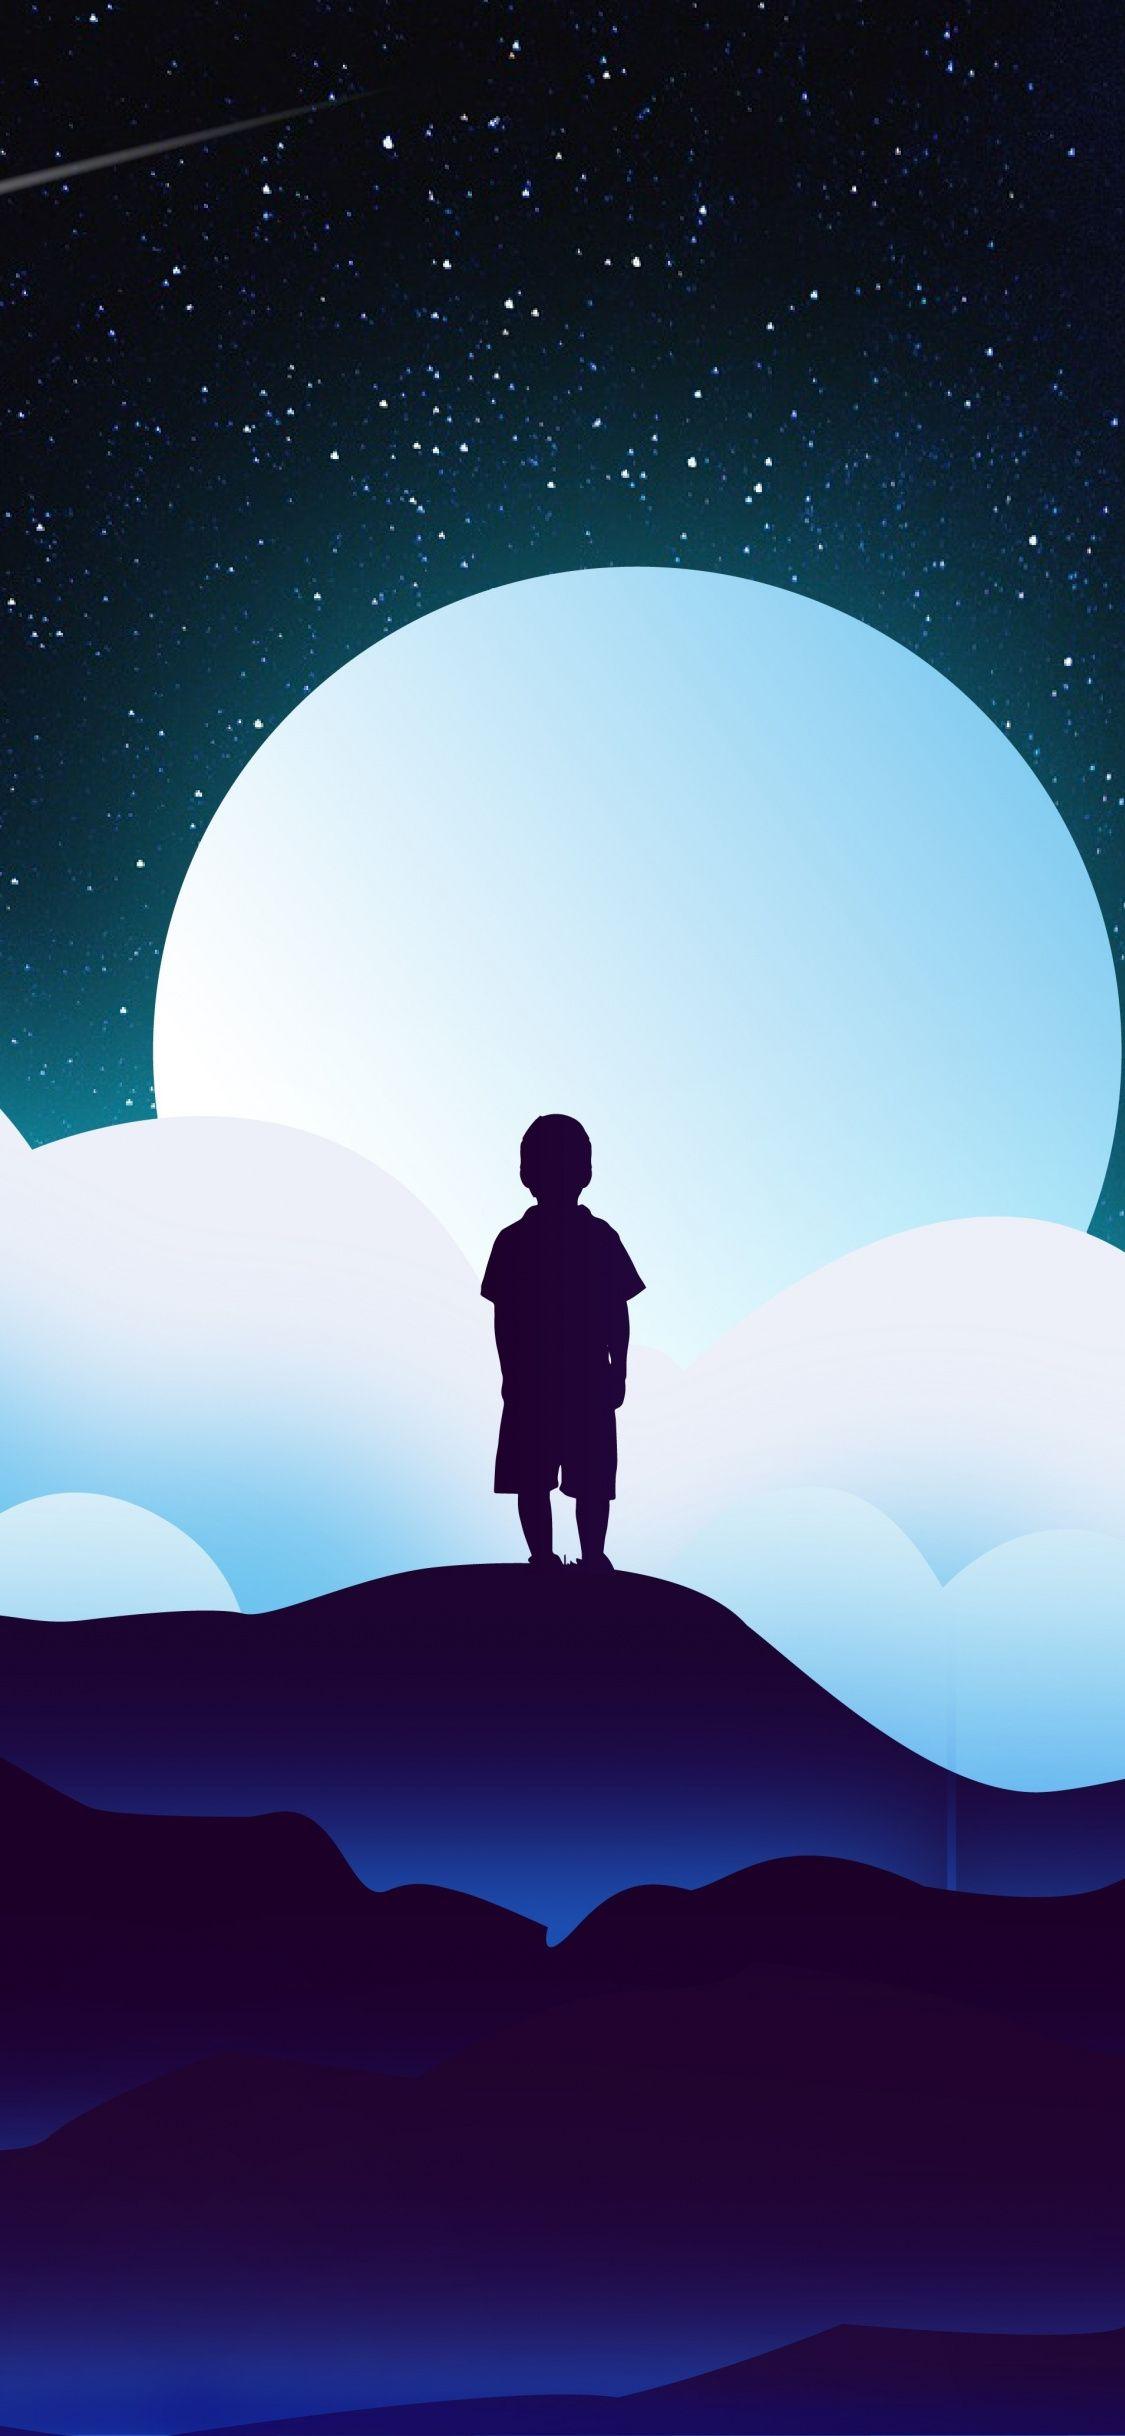 Fantasy Art Child Silhouette Clouds Moon Space 1125x2436 Wallpaper Infinity Wallpaper Wallpaper Fantasy Art Children